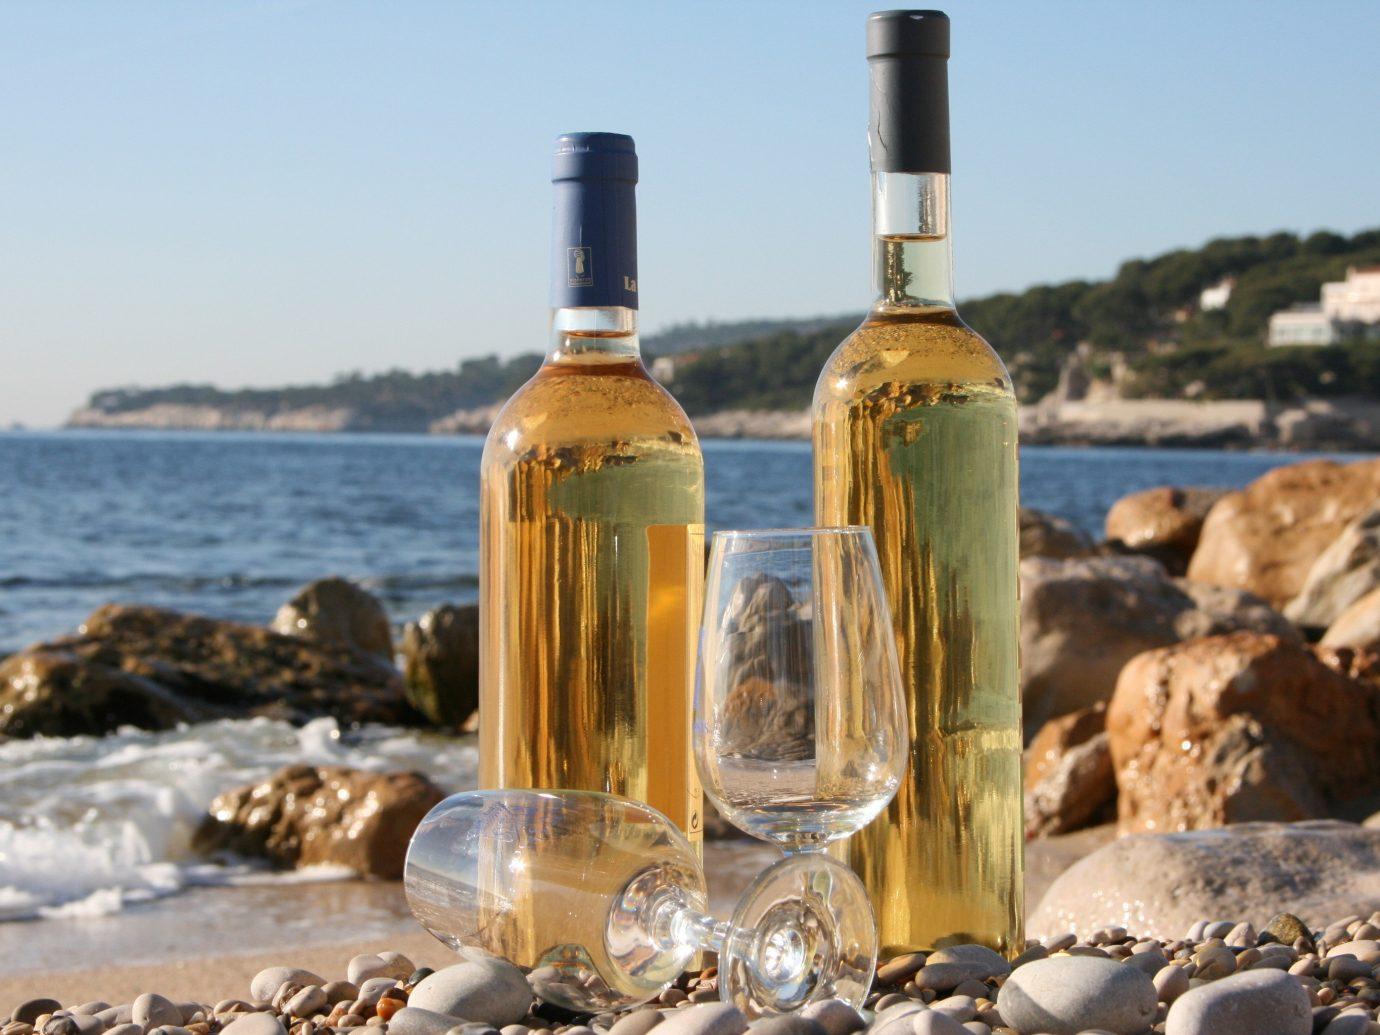 Road Trips Trip Ideas sky outdoor water alcoholic beverage distilled beverage Drink glass bottle wine bottle liqueur alcohol